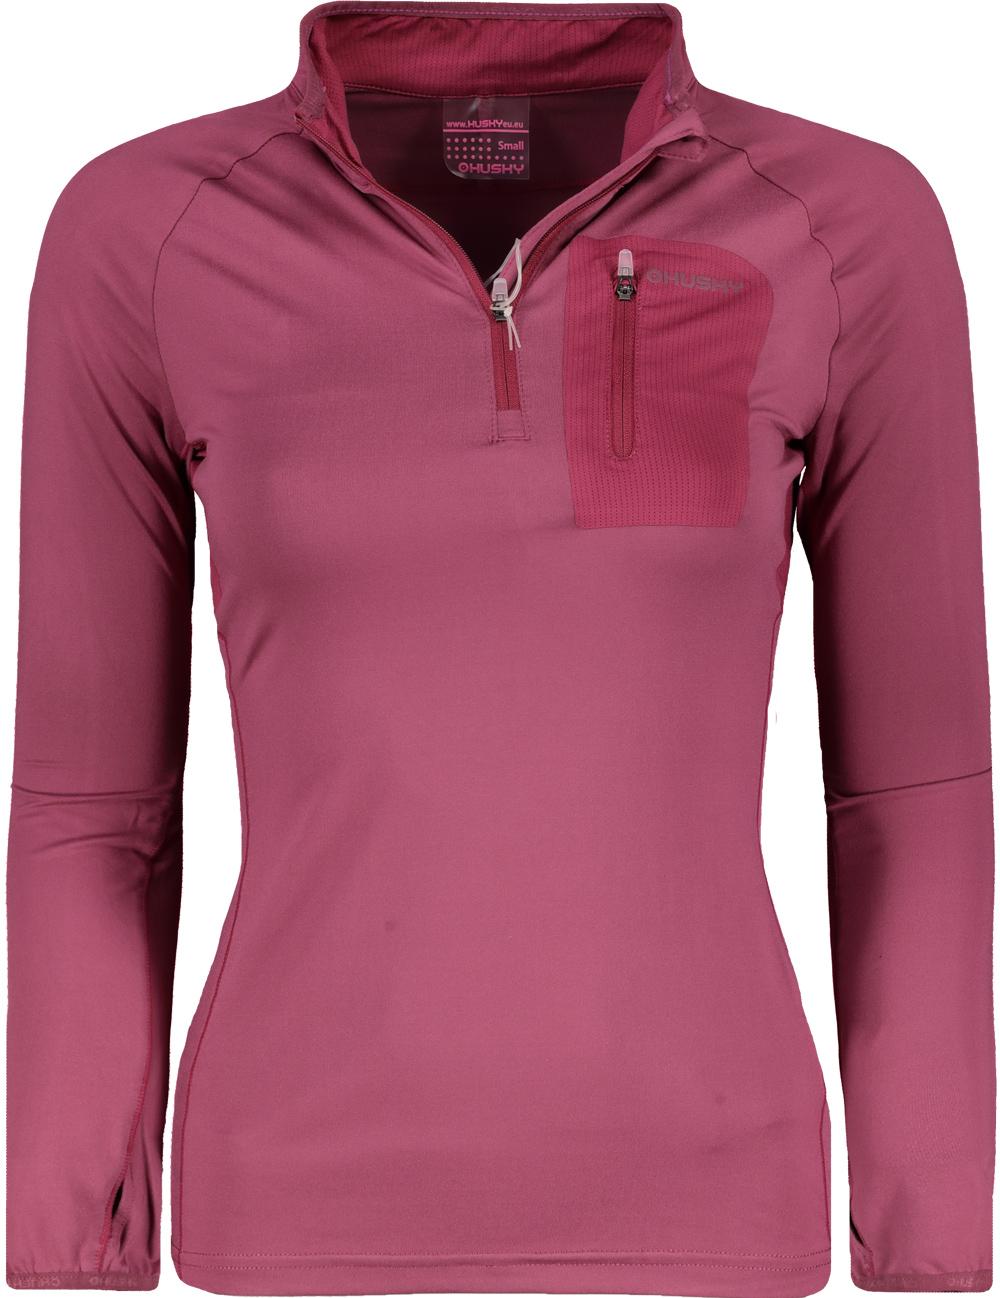 Women's sweatshirt HUSKY TARR L